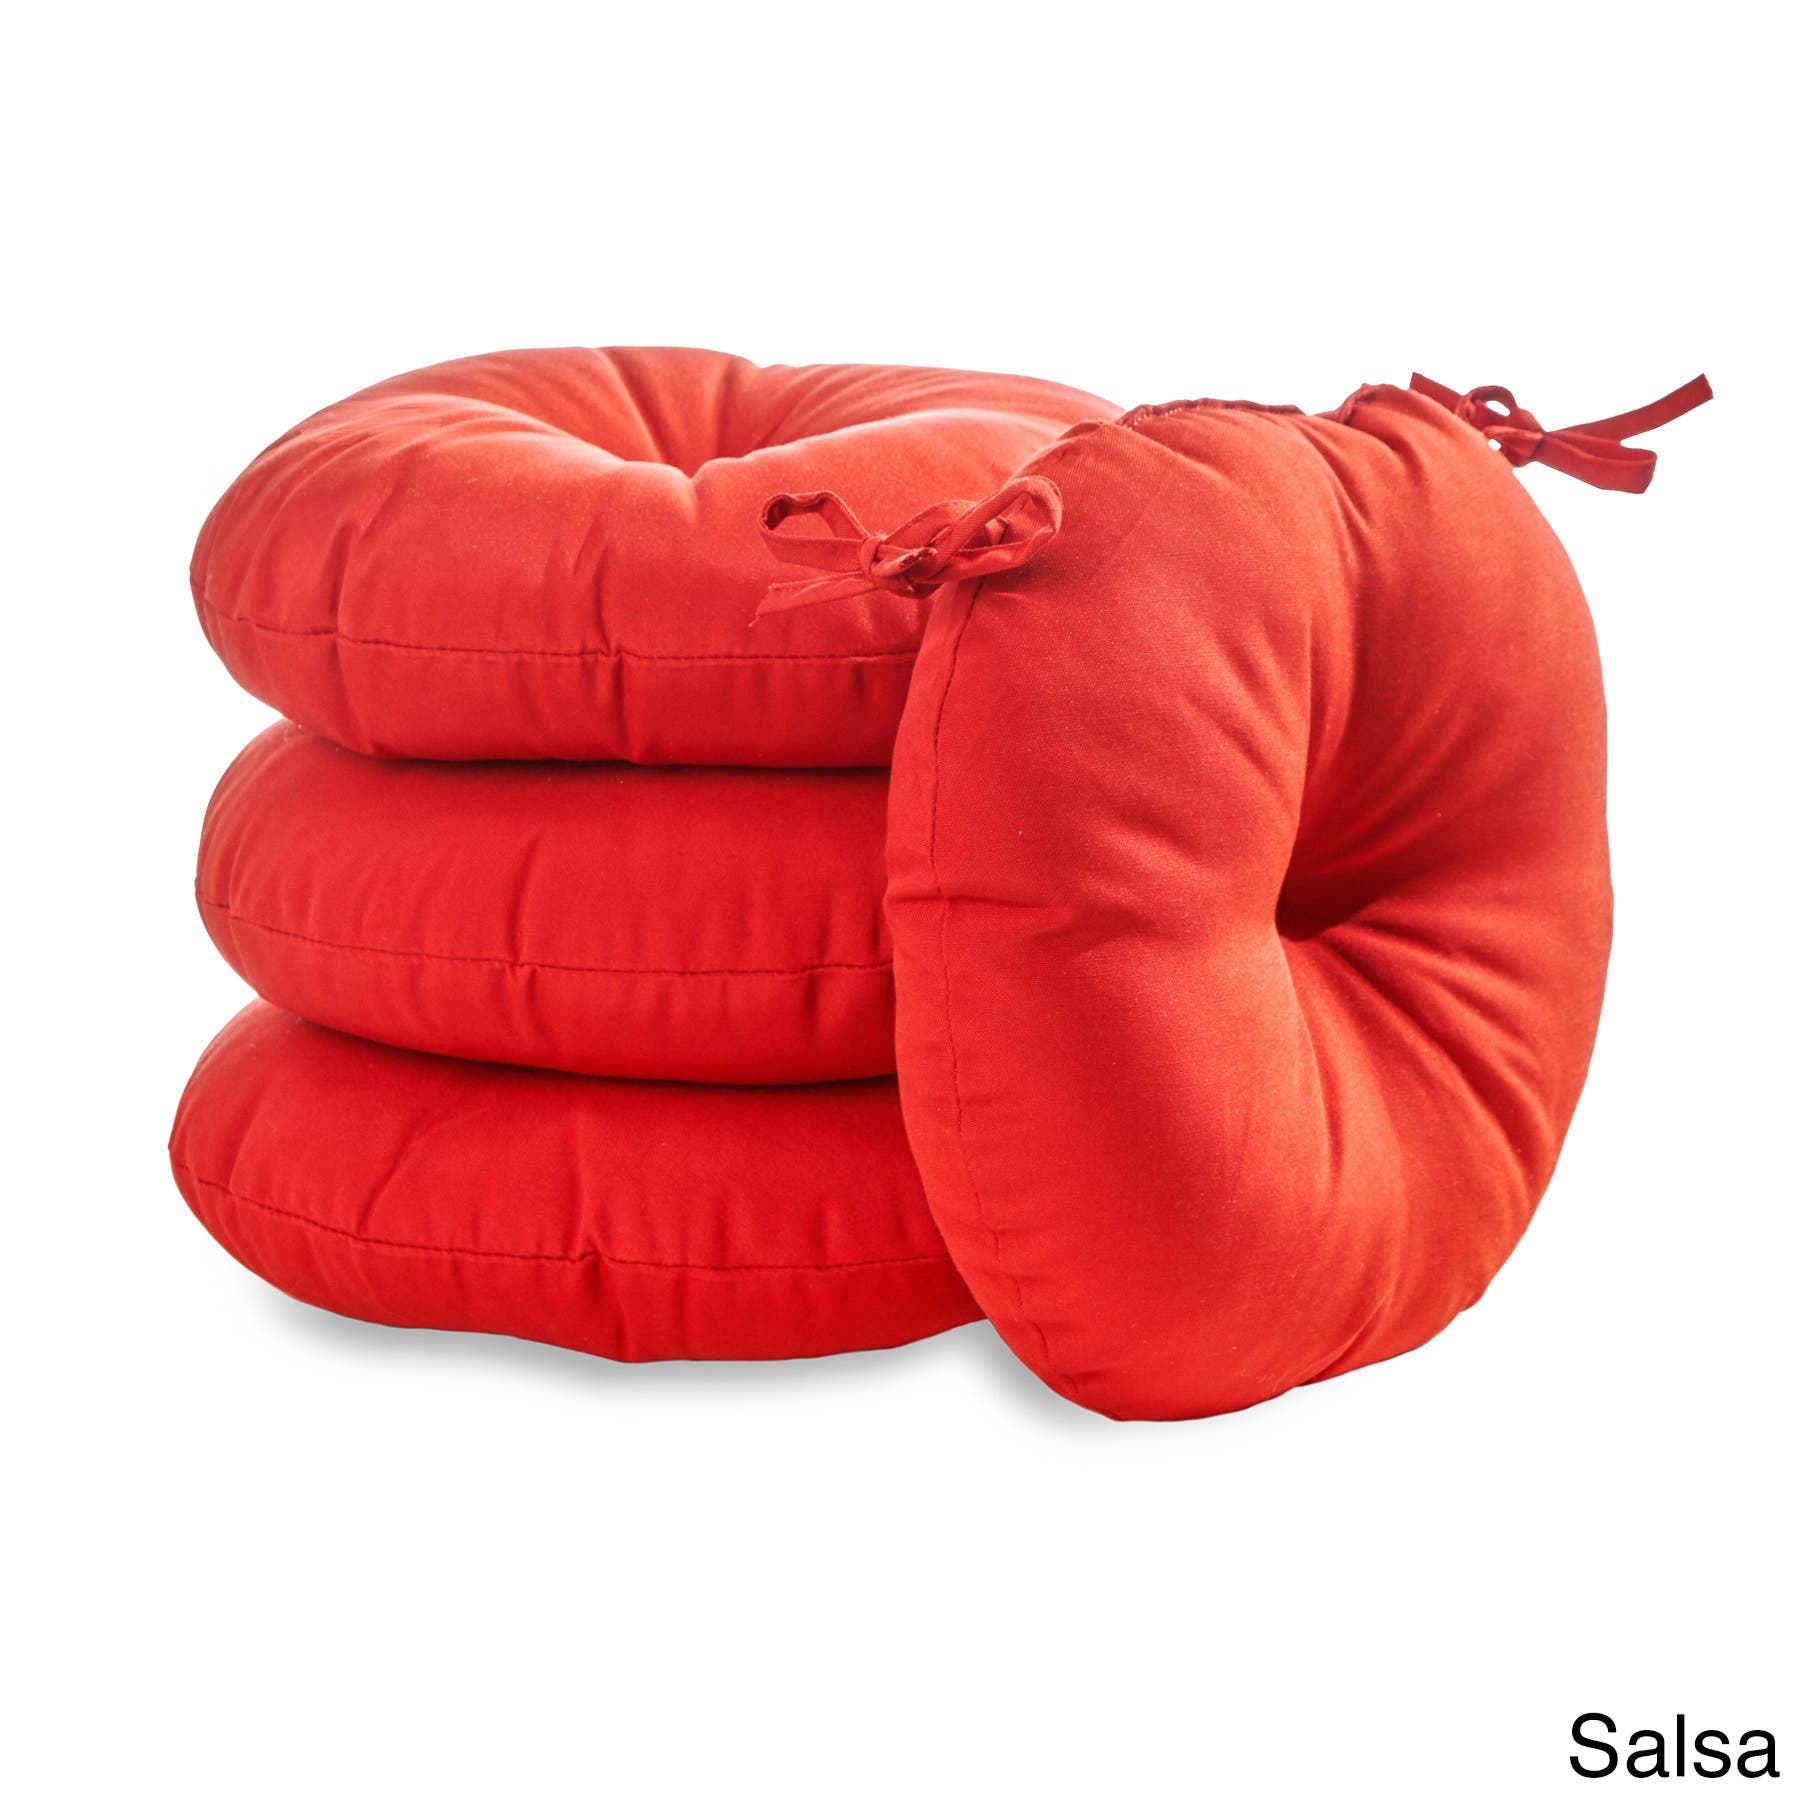 18 Round Patio Chair Cushions: Outdoor Cushions & Pillows For Less